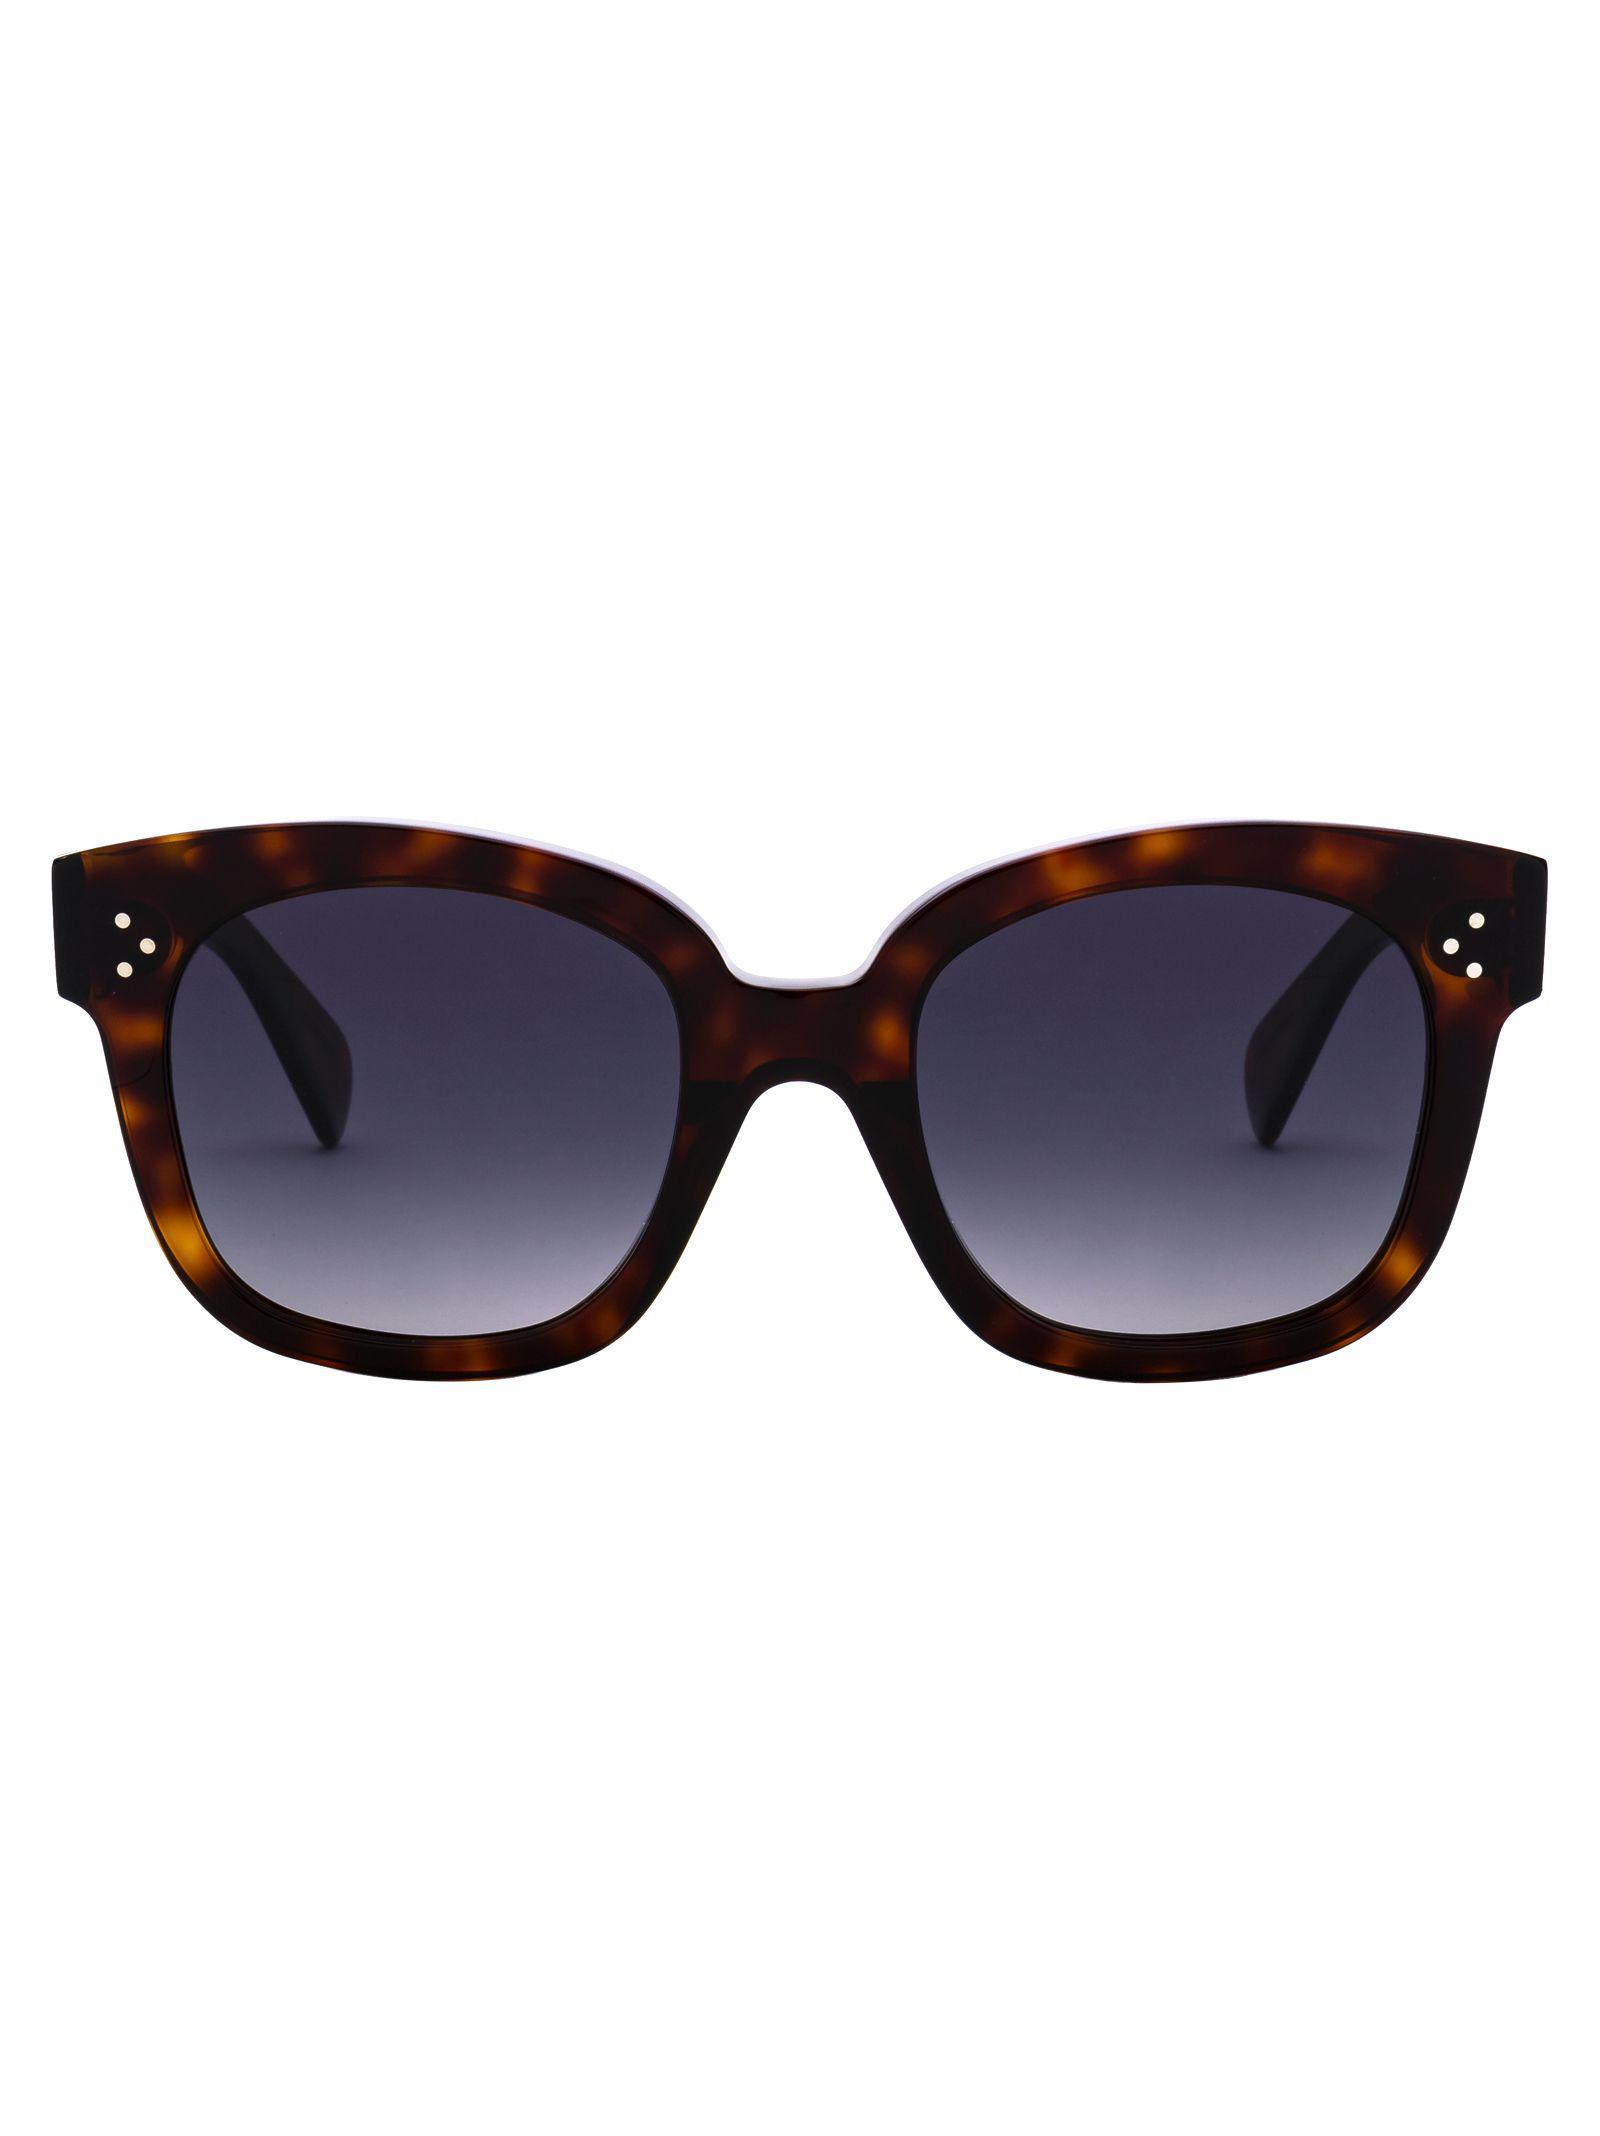 08a36791c0c4 BrownModesens Sunglasses Céline Eyewear Audrey Celine In New 5Ajqc34RL